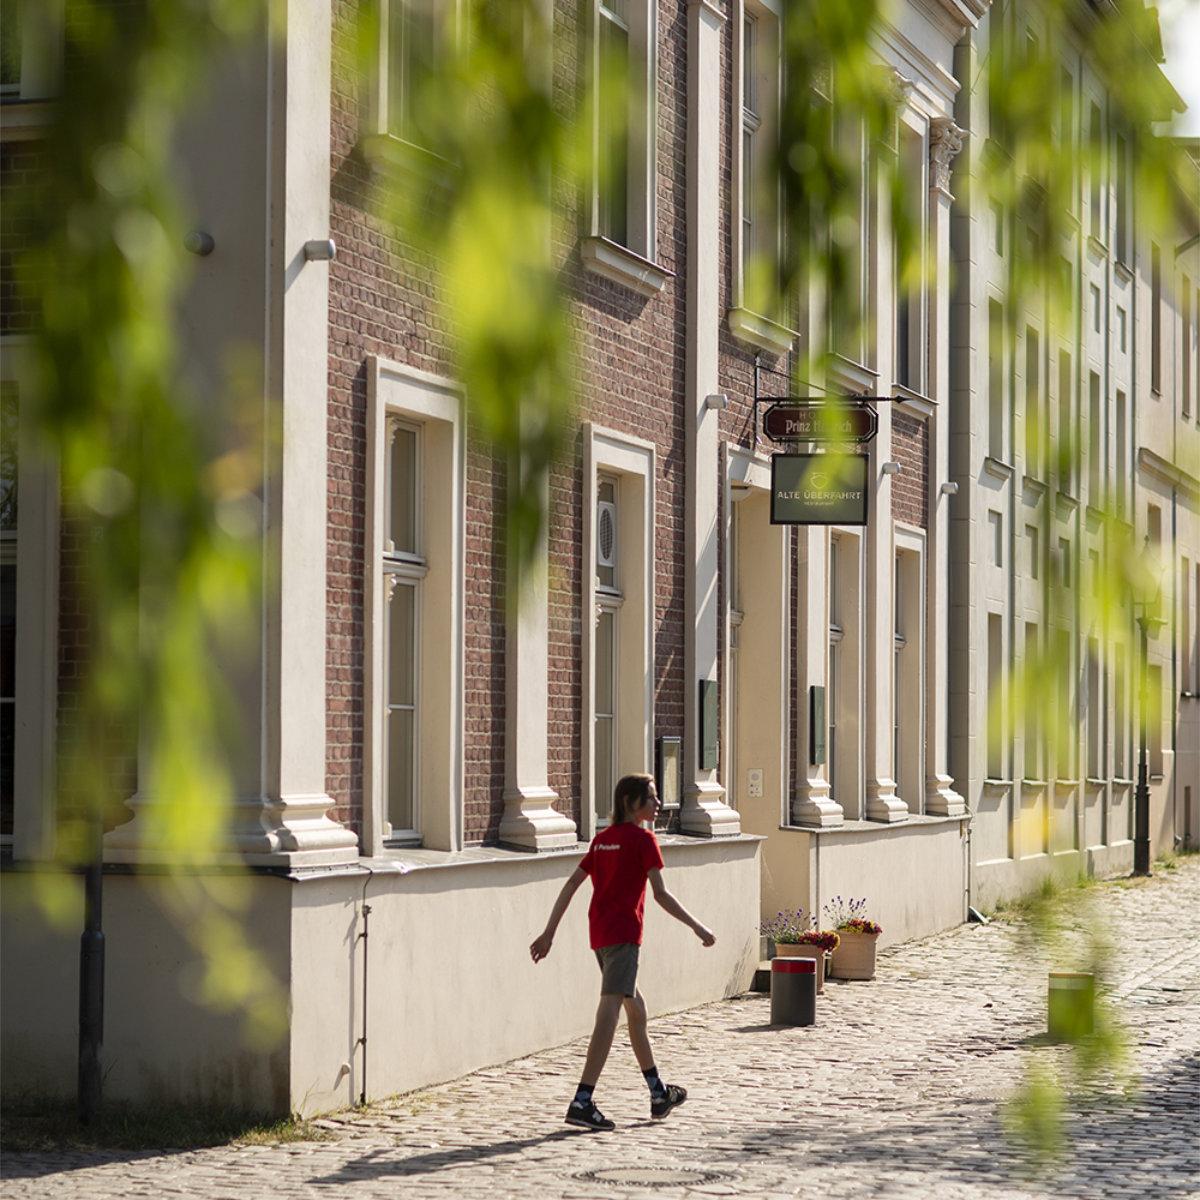 Alte Überfahrt Fassade ©Joerg Lehmann